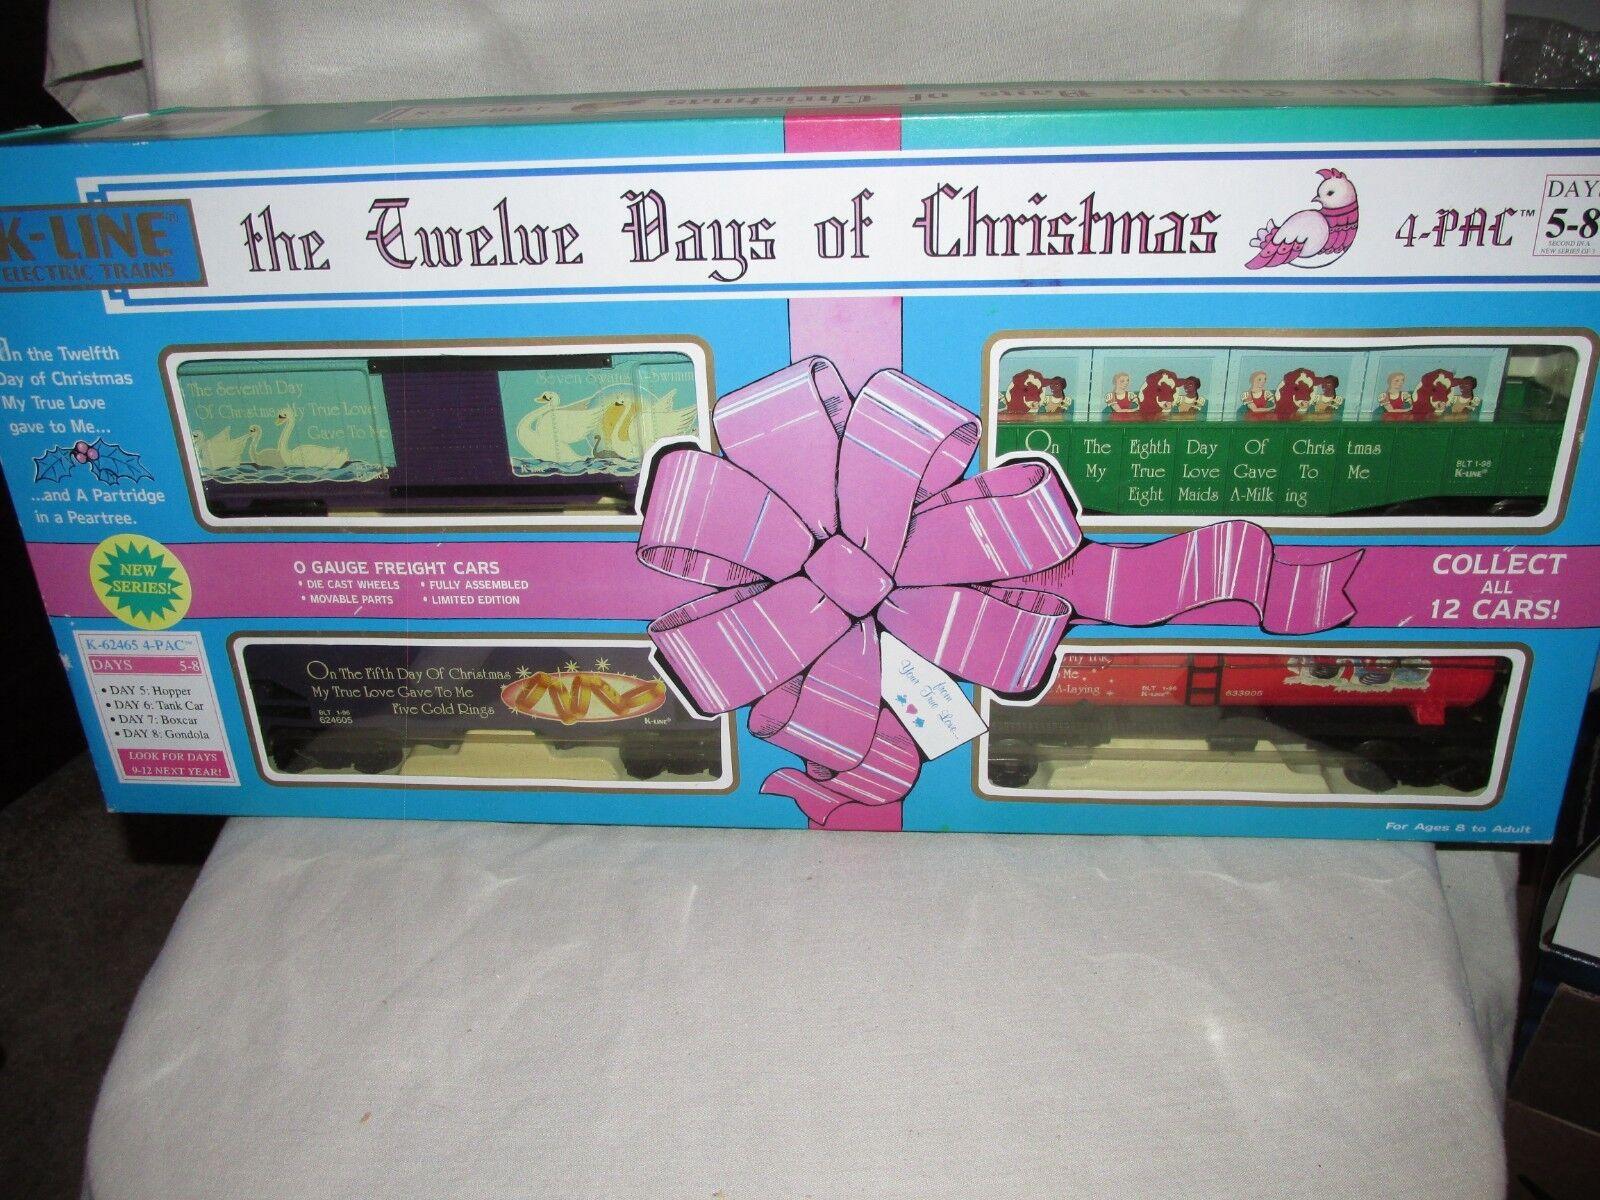 K-Line O/O27 Gauge 1996 12 Days Of Christmas 4 Car Set. 5th,6th,7th & 8th Days